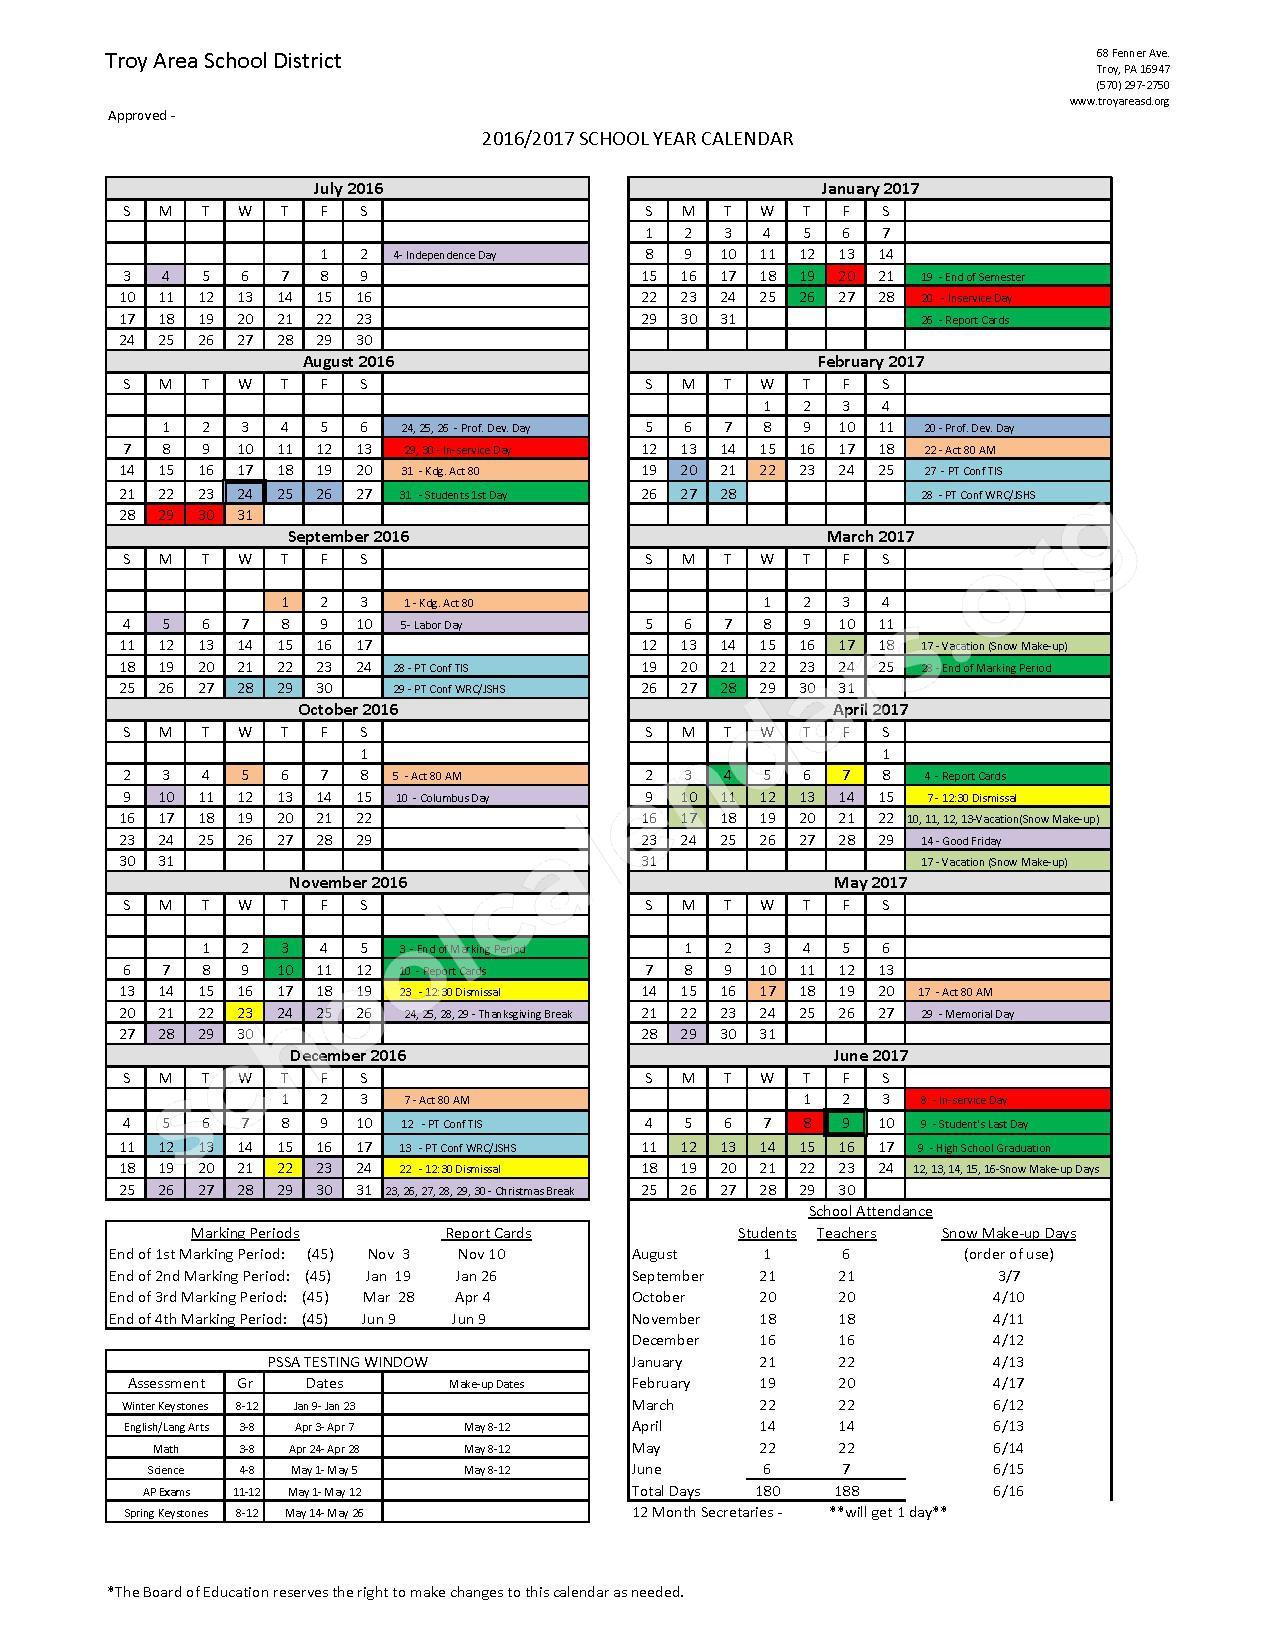 2016 - 2017 District Calendar – Troy Area School District – page 1